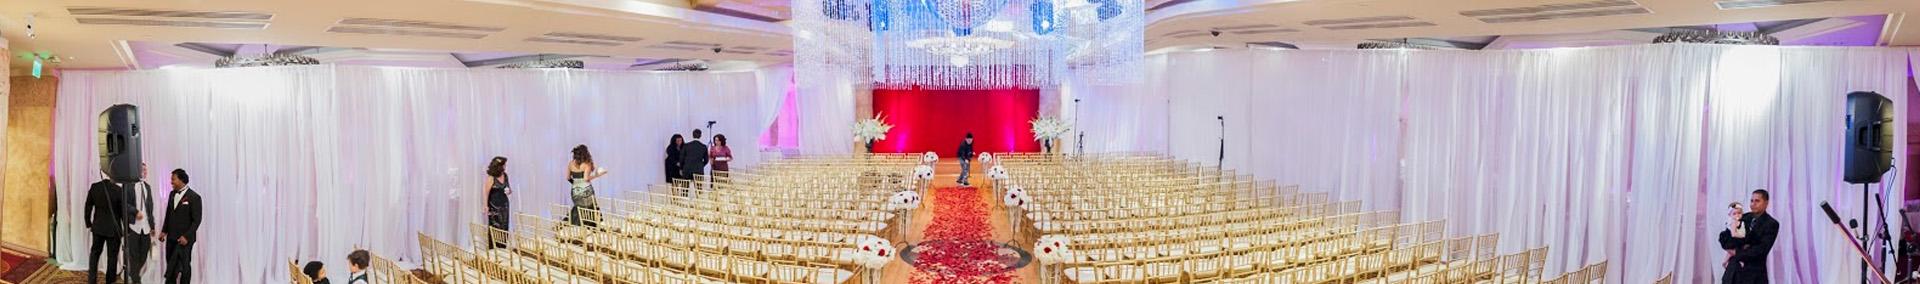 Wedding ceremony setup on dance floor